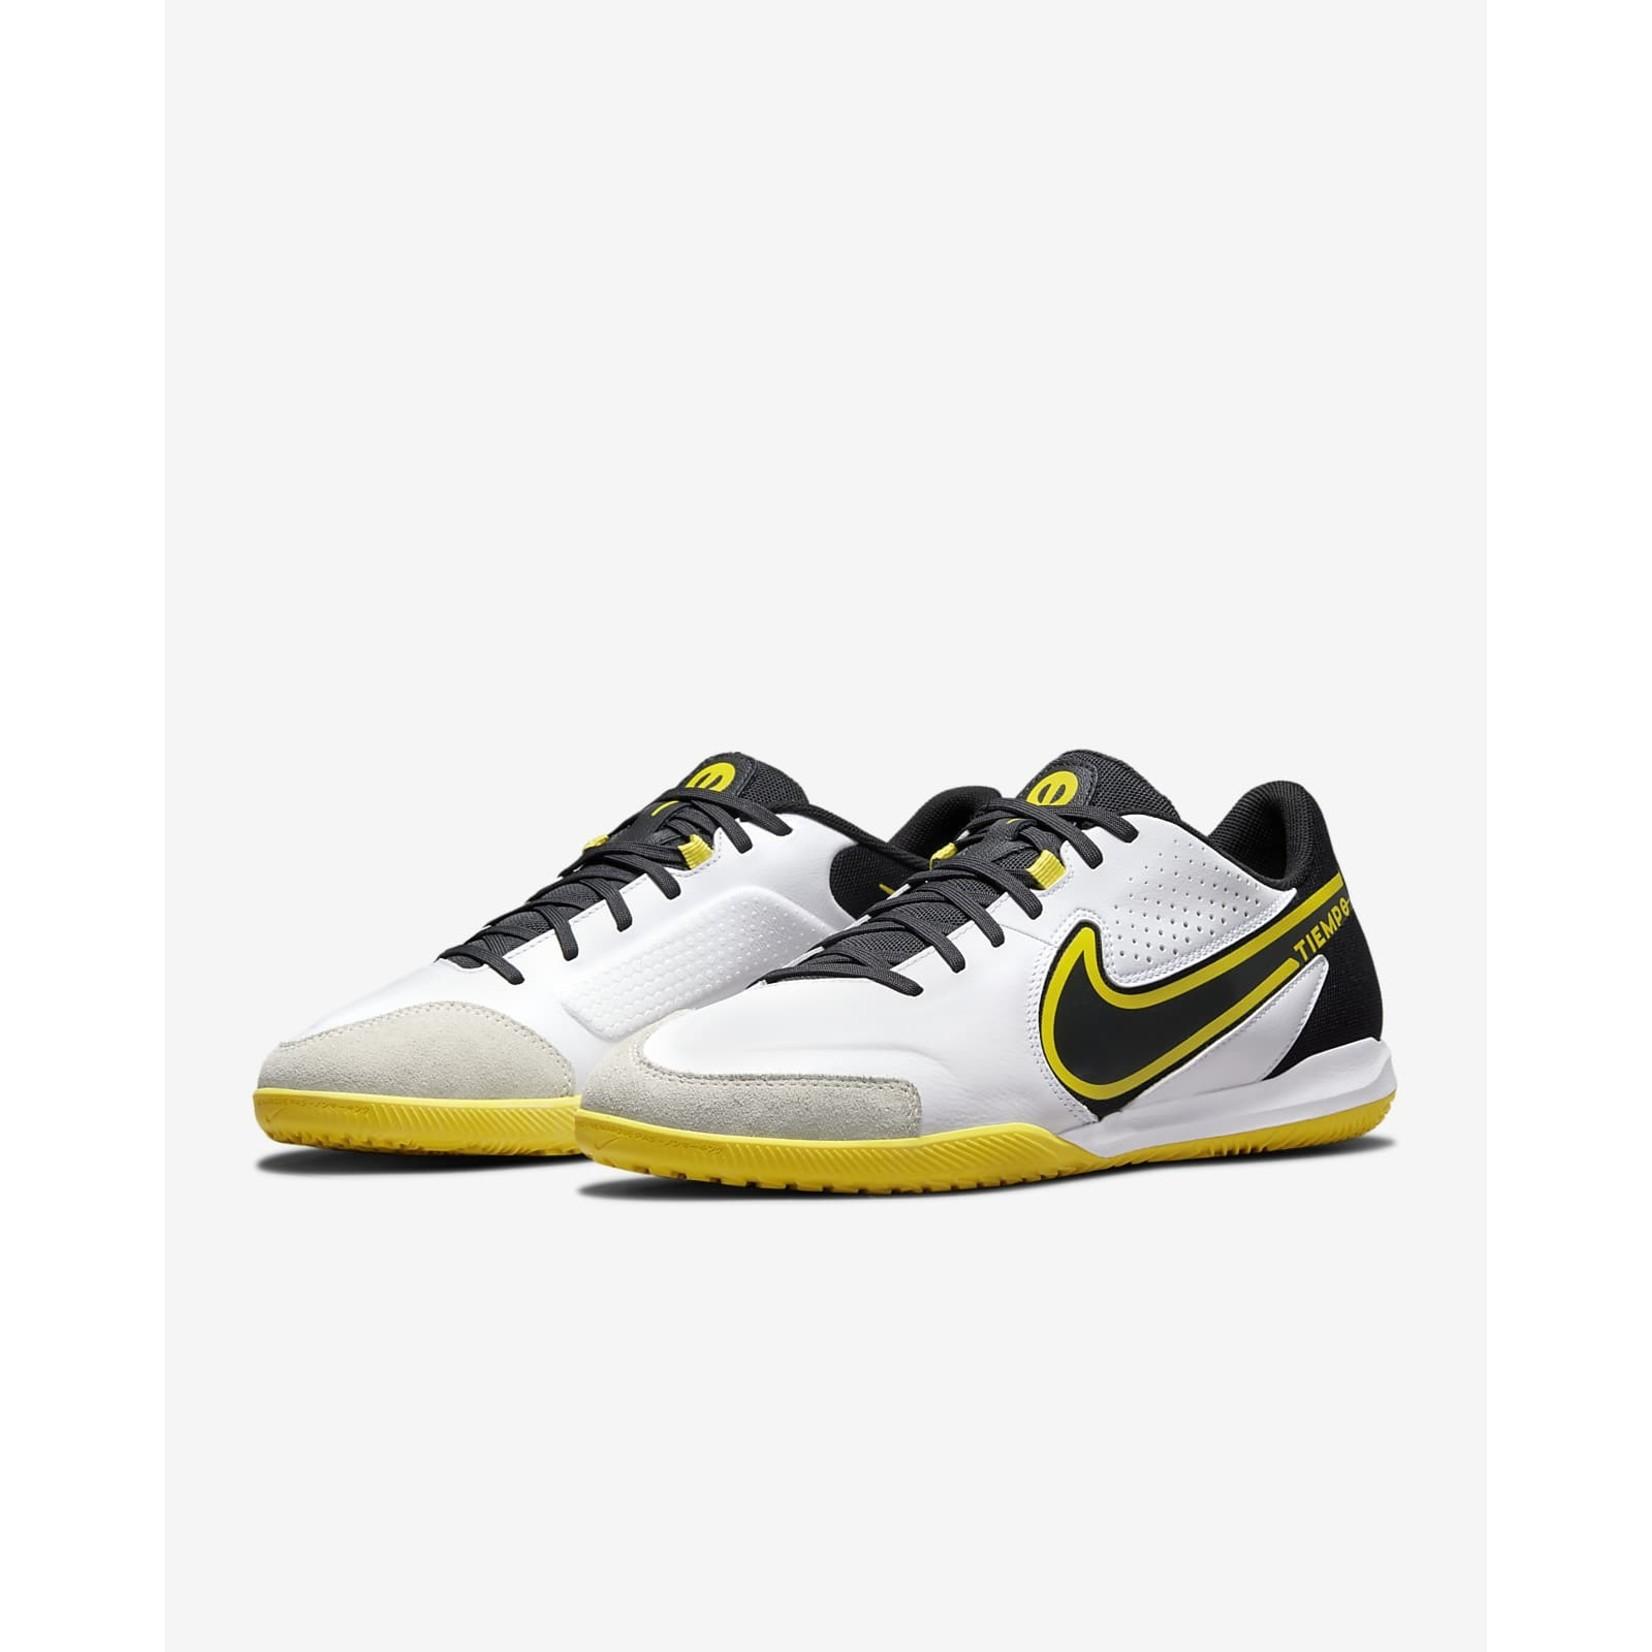 Nike Nike Indoor Soccer Shoes, Tiempo Legend 9 Academy, Mens